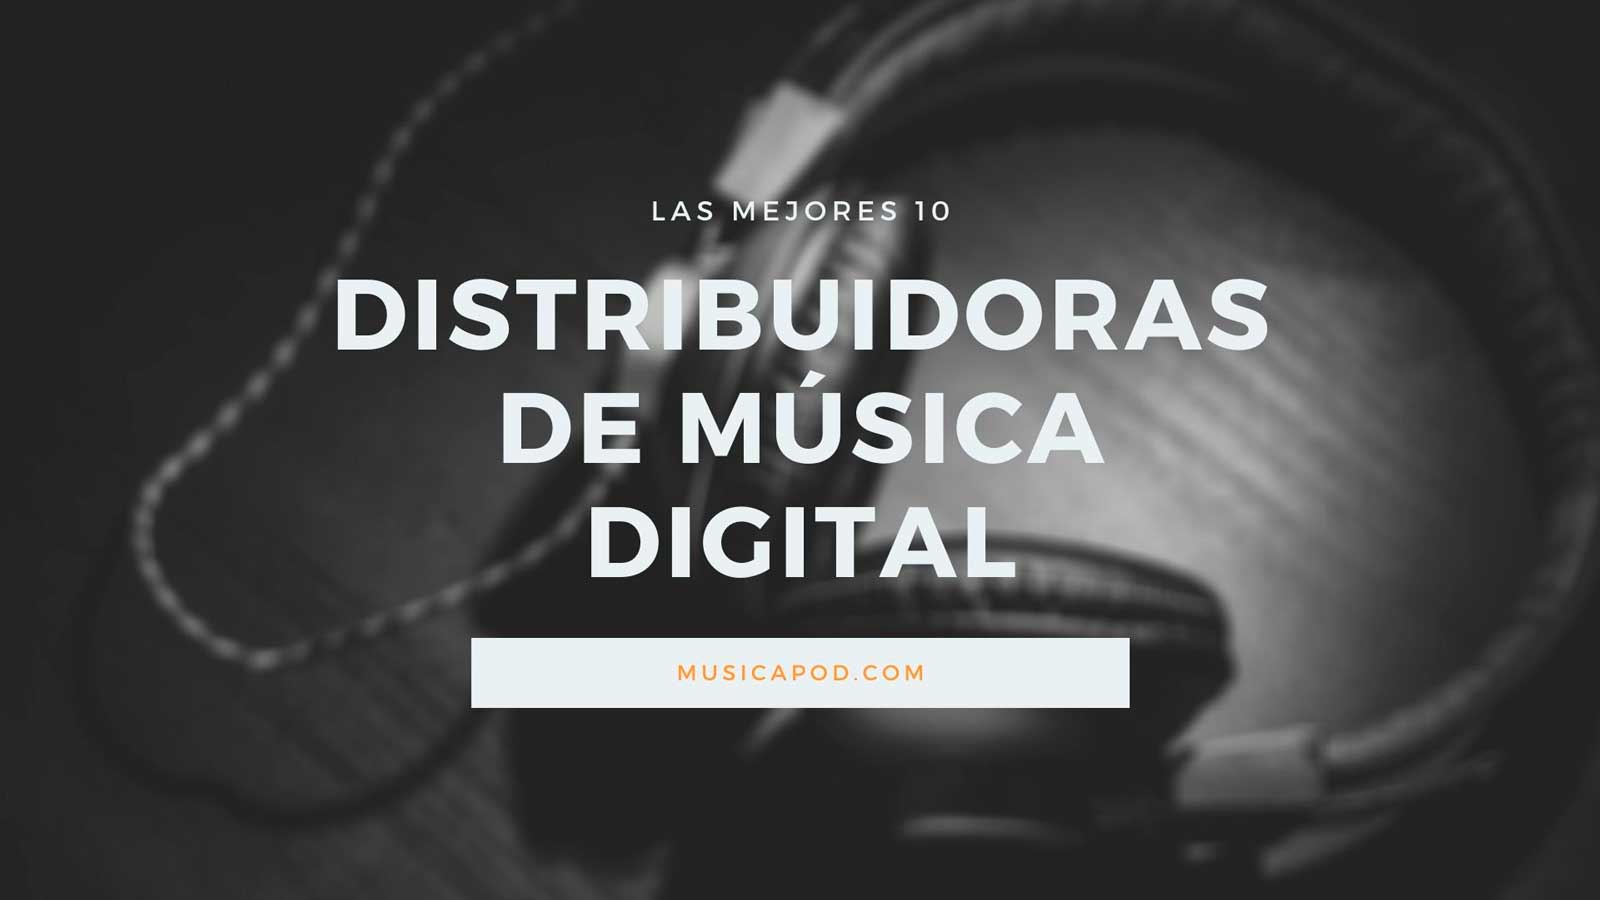 distribuidoras de musica digital